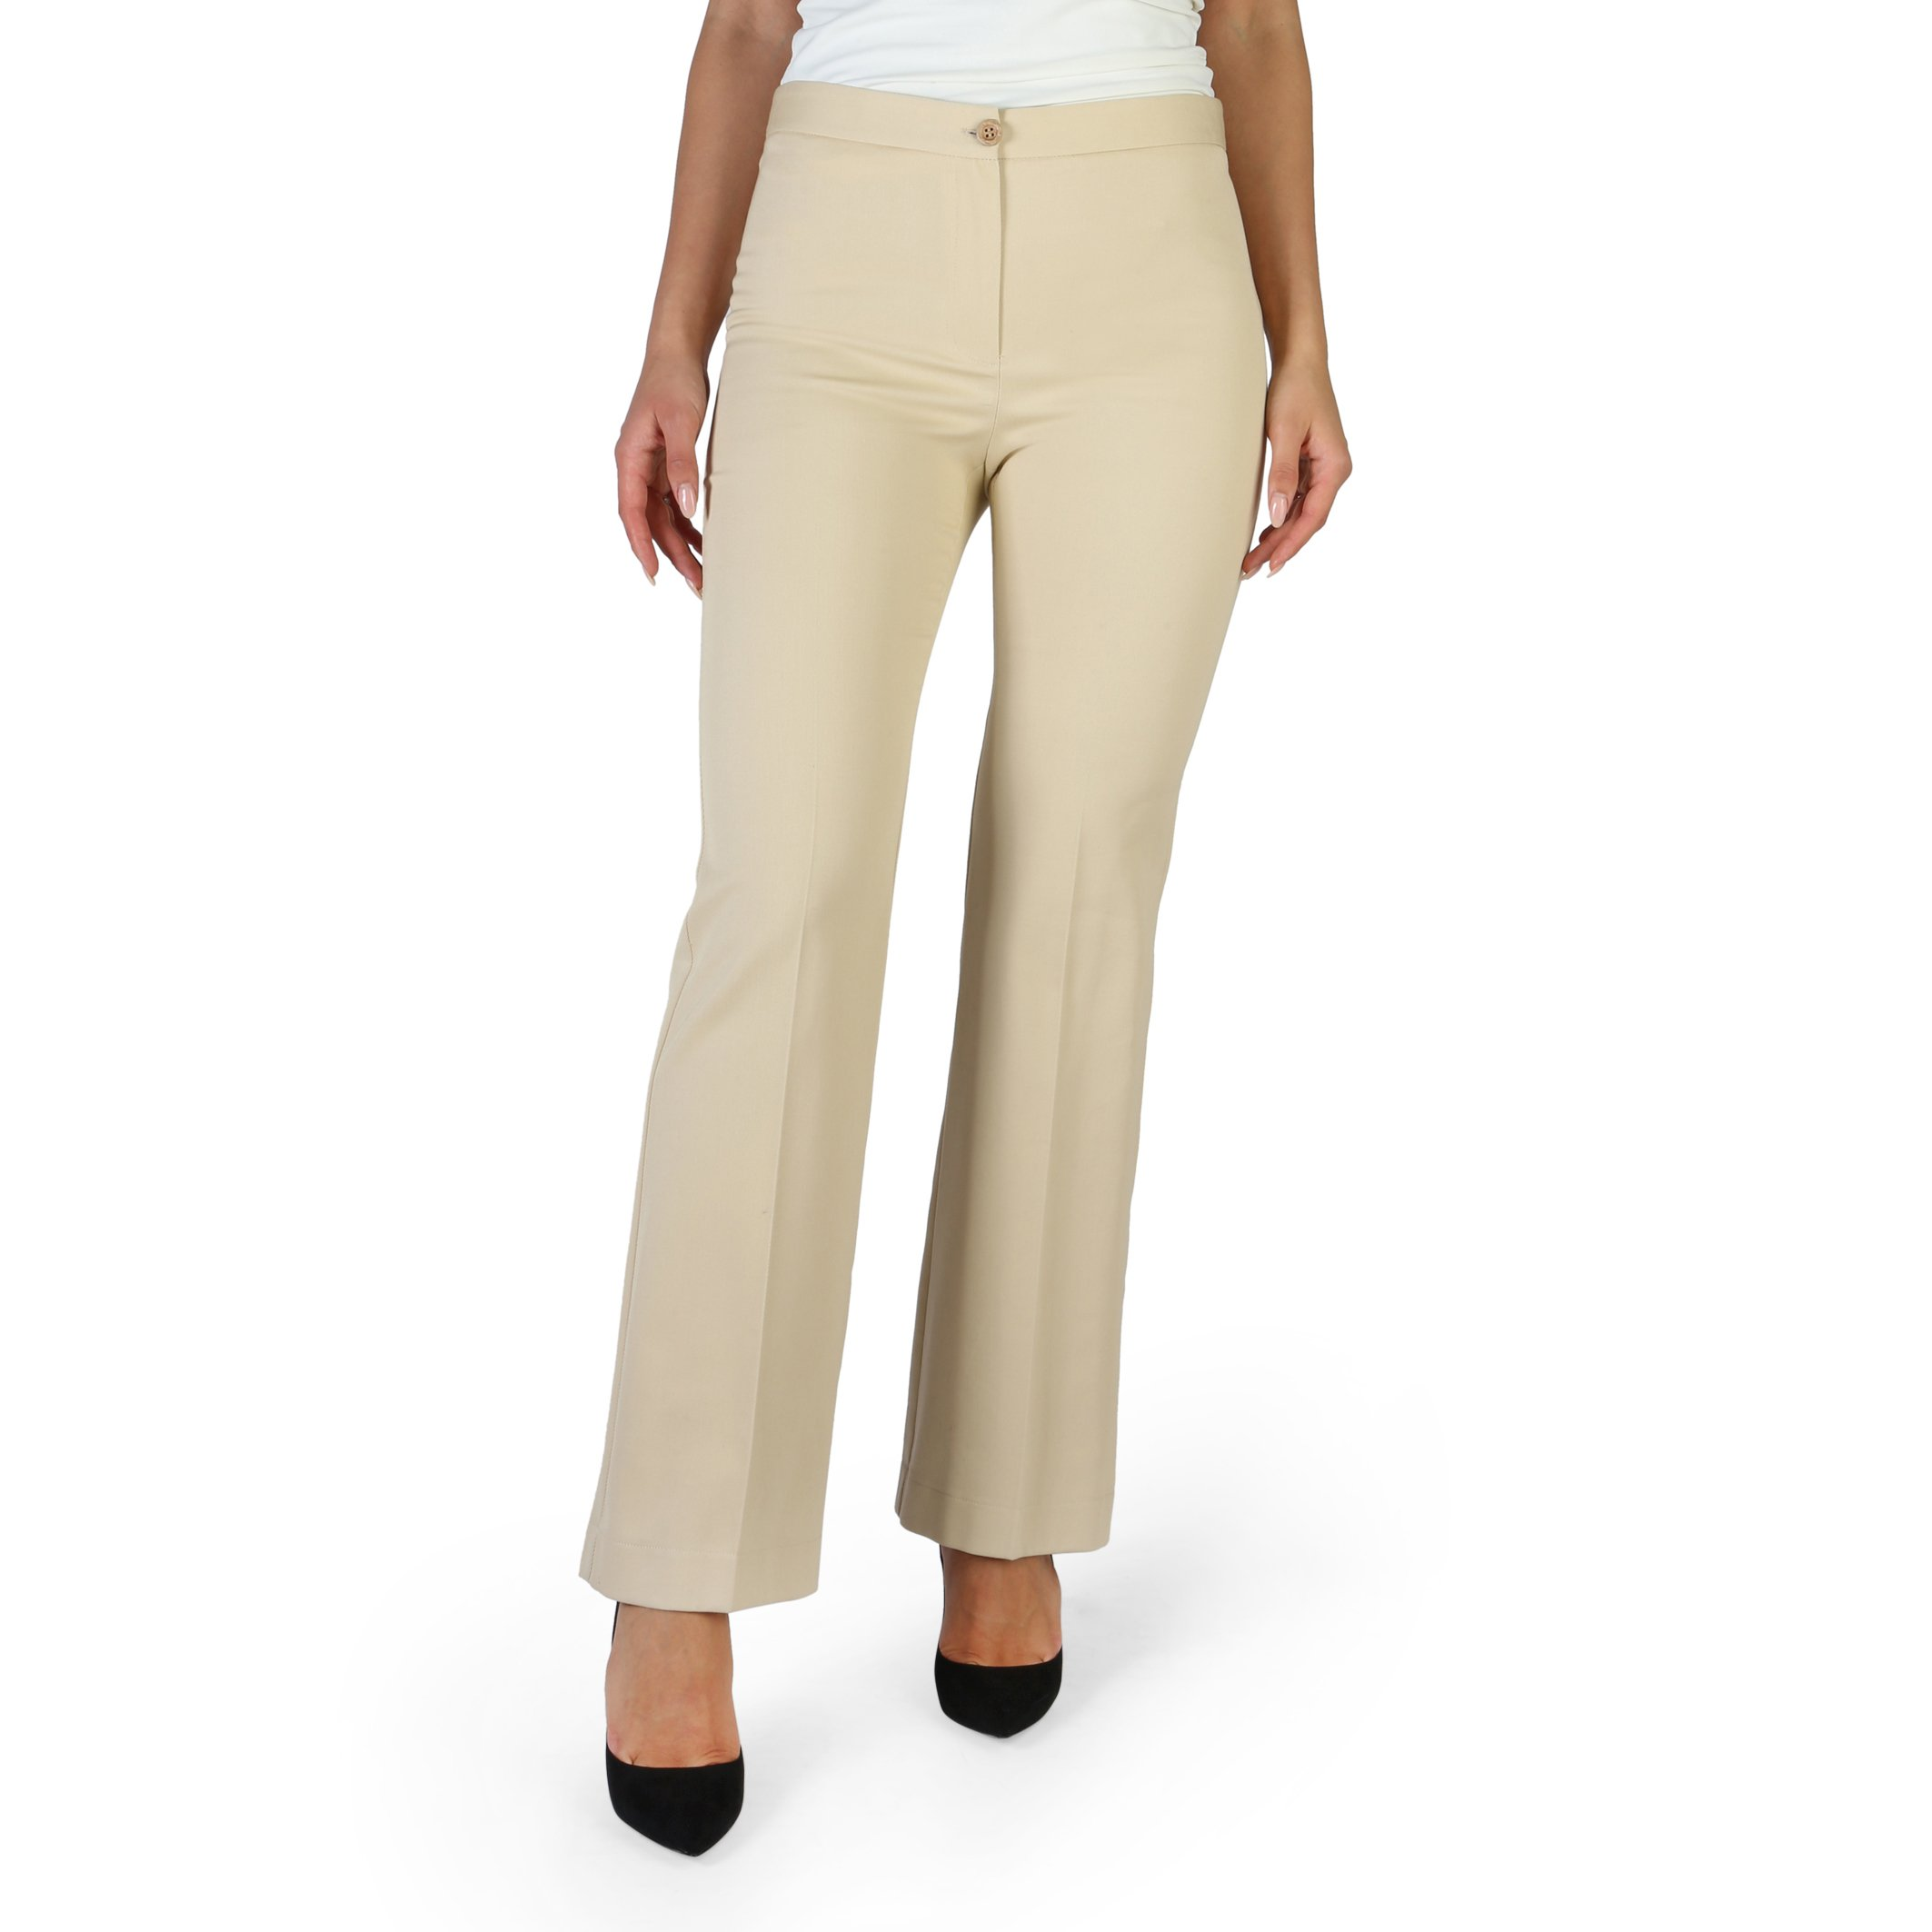 Fontana 2.0 Women's BRENDA Trouser Various Colours 325679 - brown-1 44